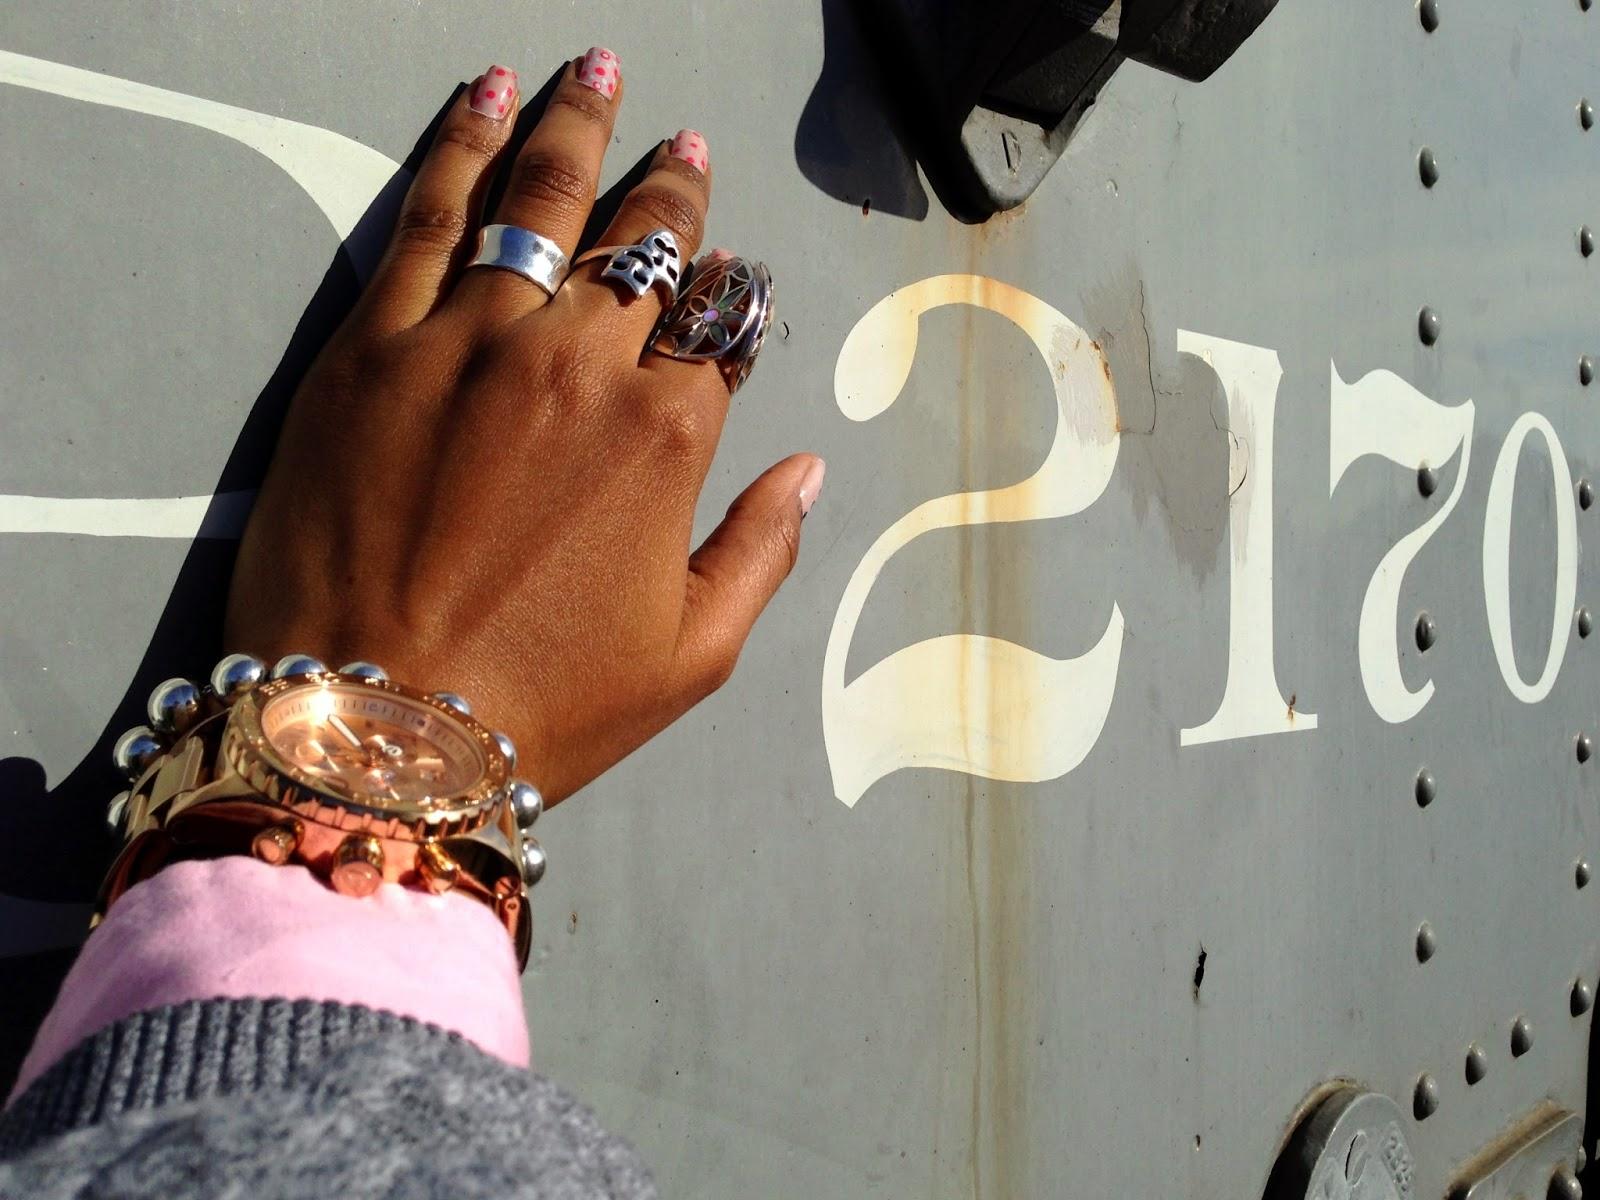 Defining Details accessories Nixon watch Tiffany & Co bracelet DIY nail design